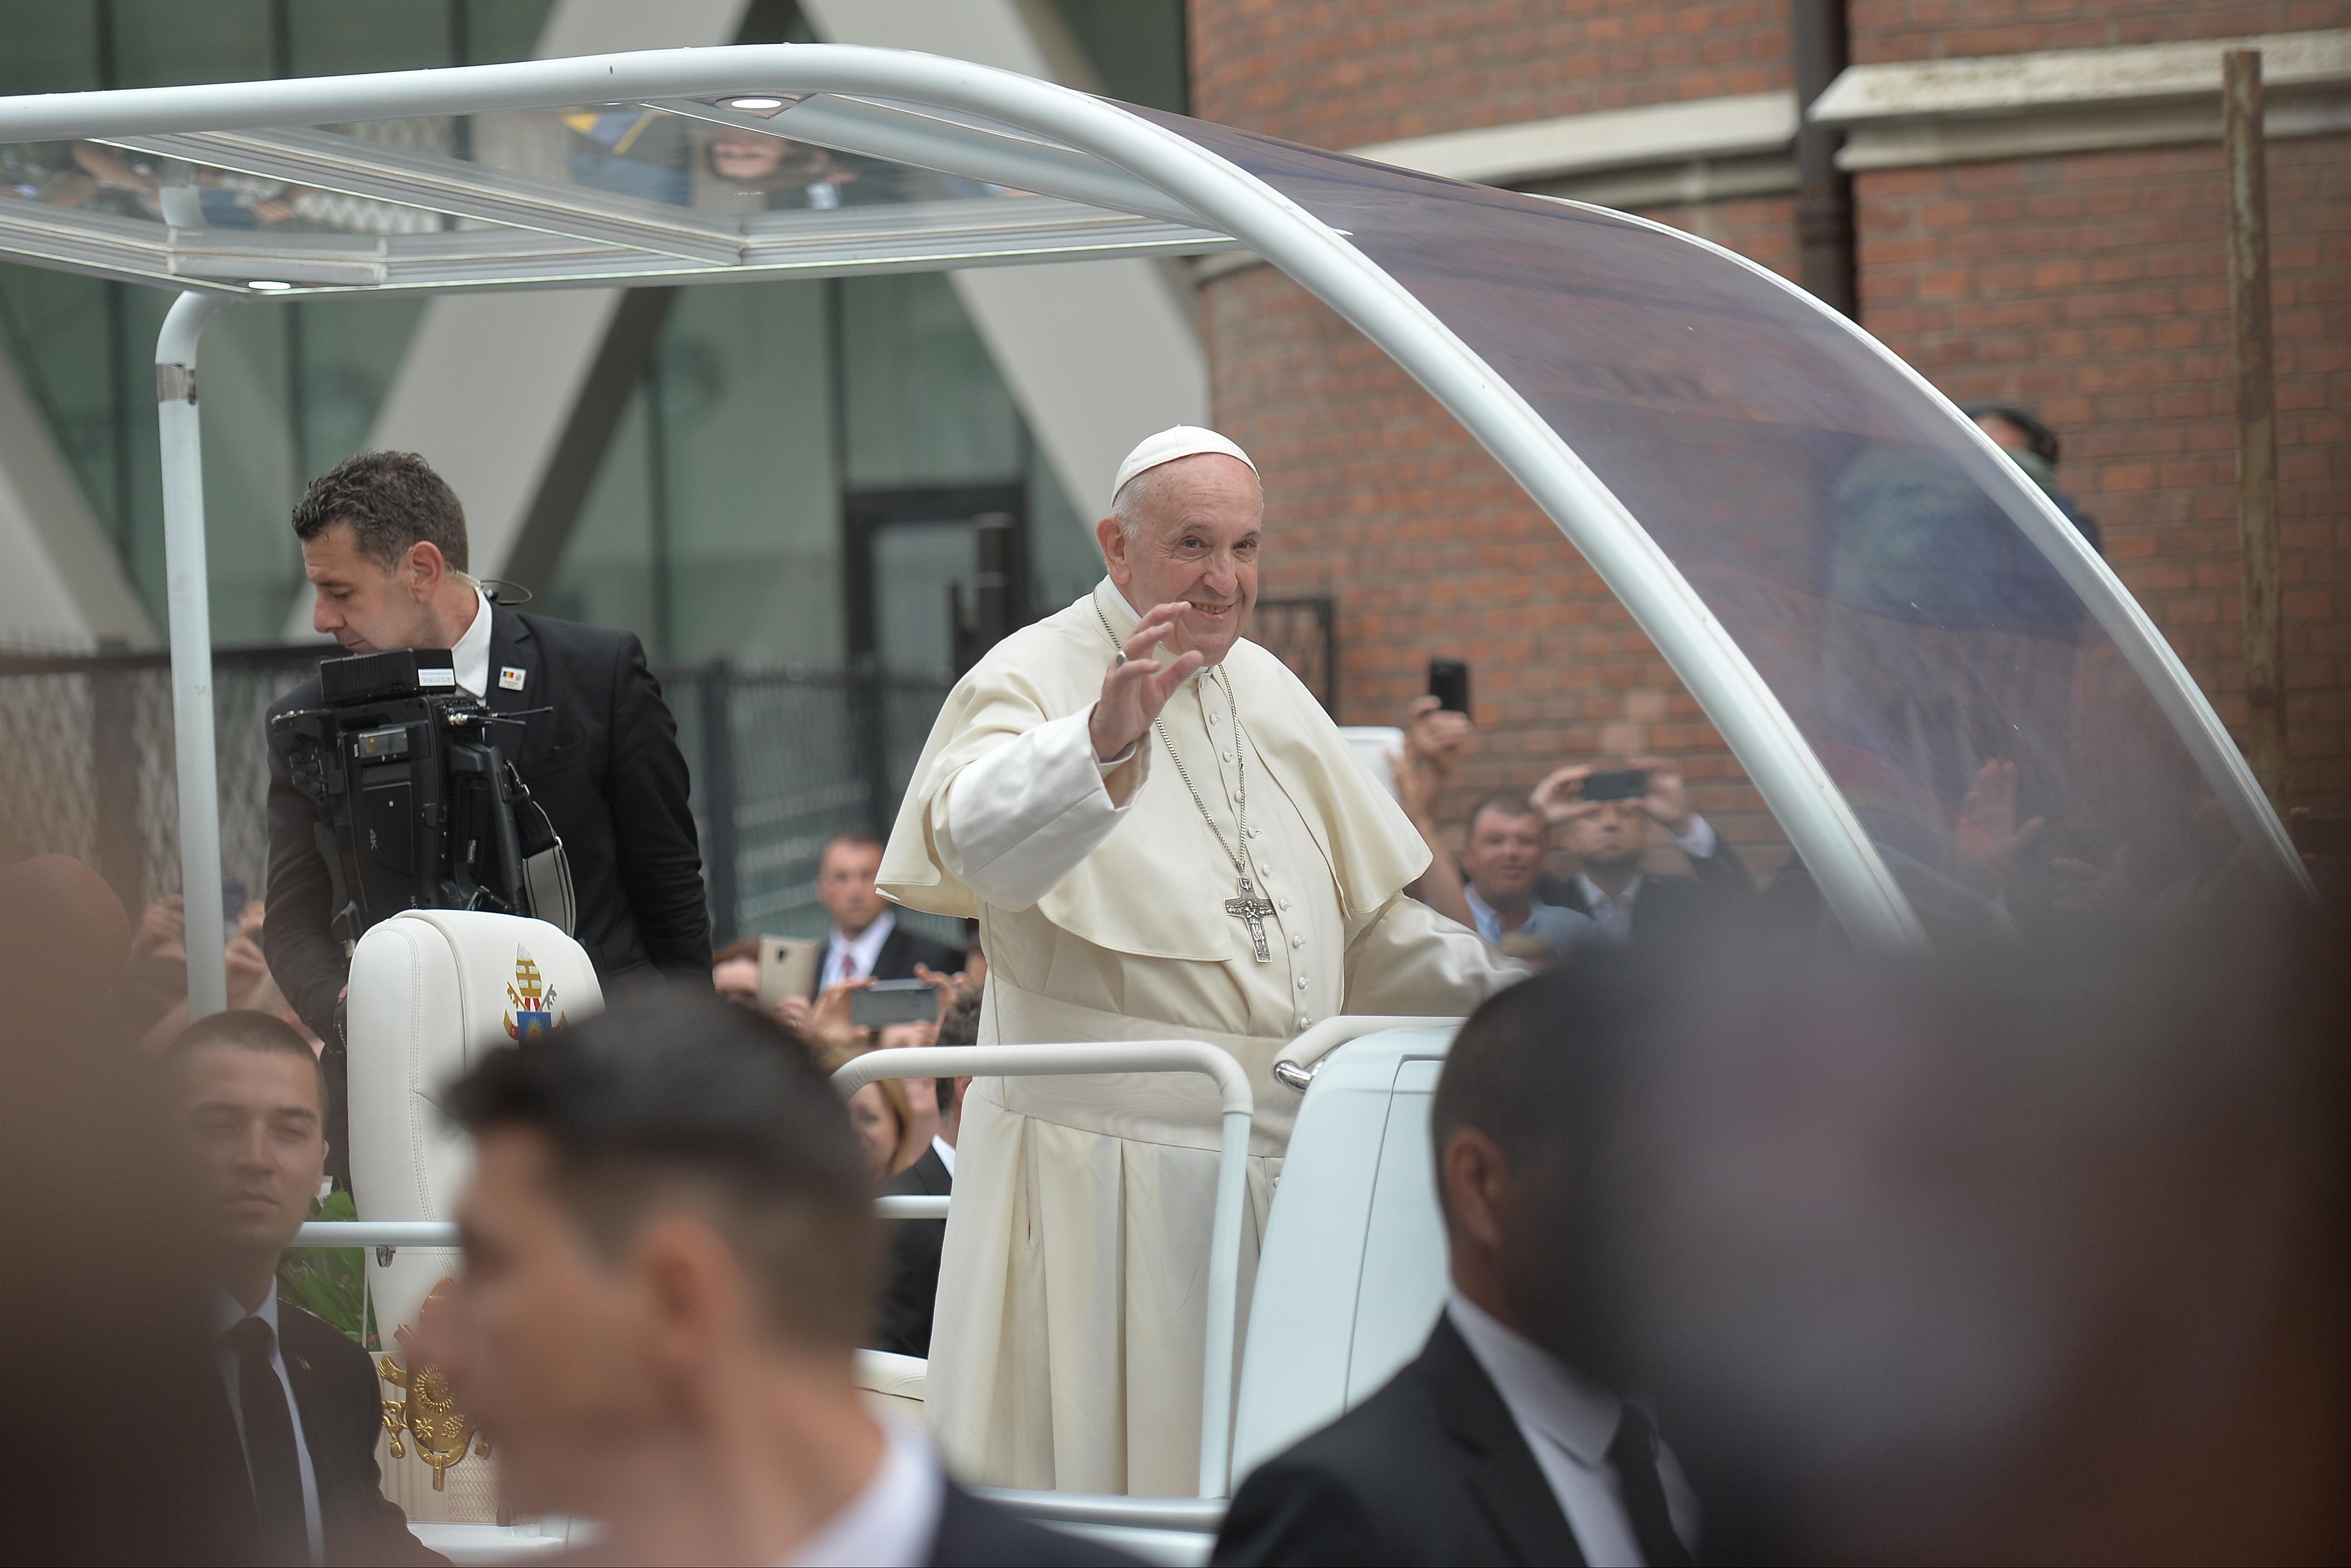 Papa Francisc în România. LIVE stream și Text de la Șumuleu Ciuc și Iași. Program 1 iunie 2019